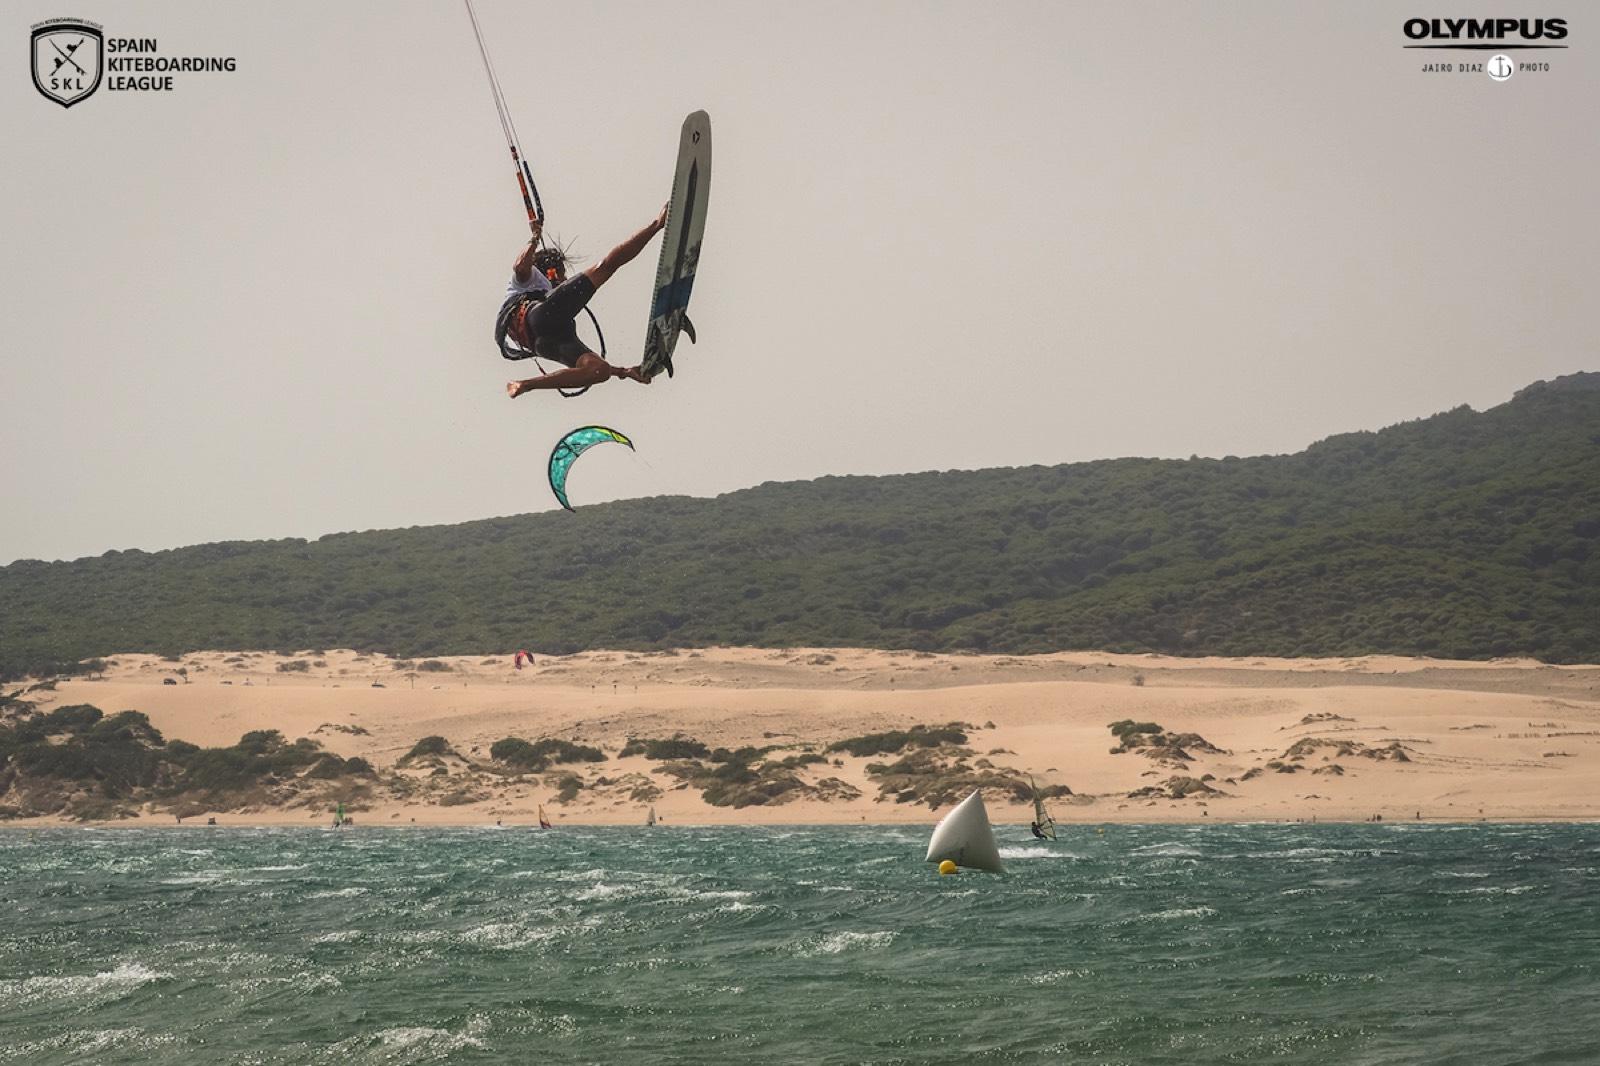 galeria-spain-kiteboarding-league-2018-23